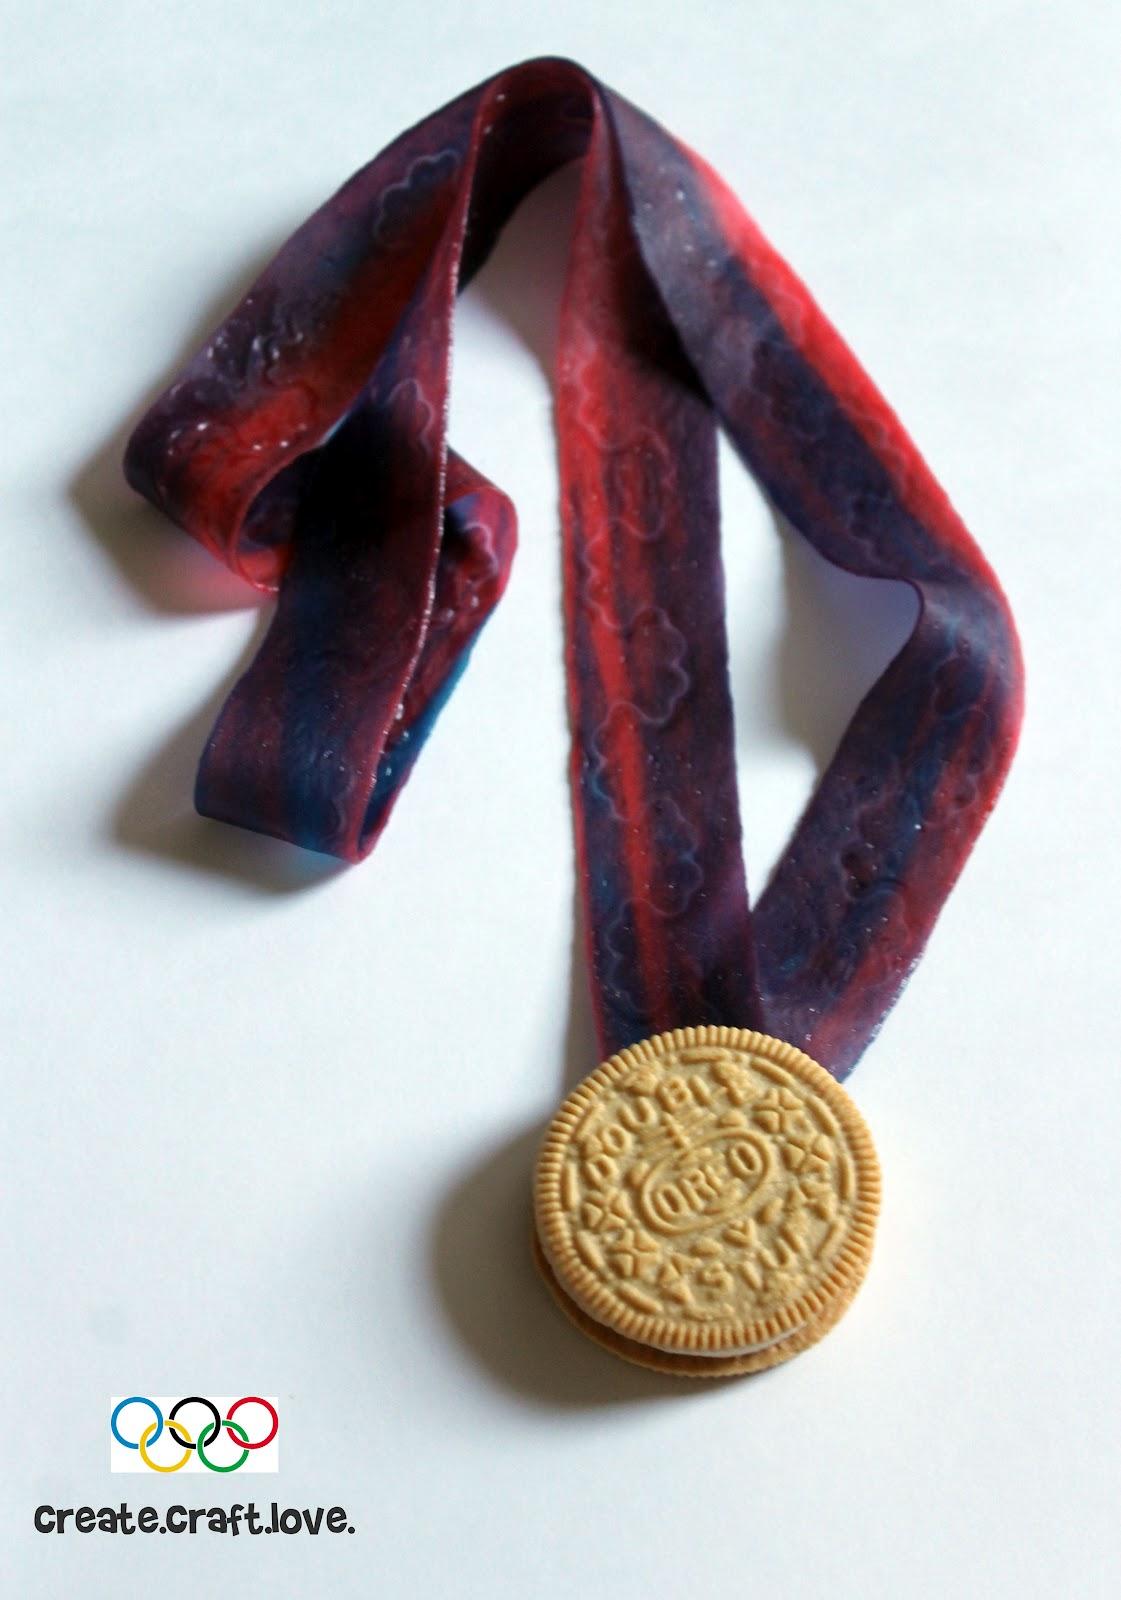 Oreo Olympic Medal